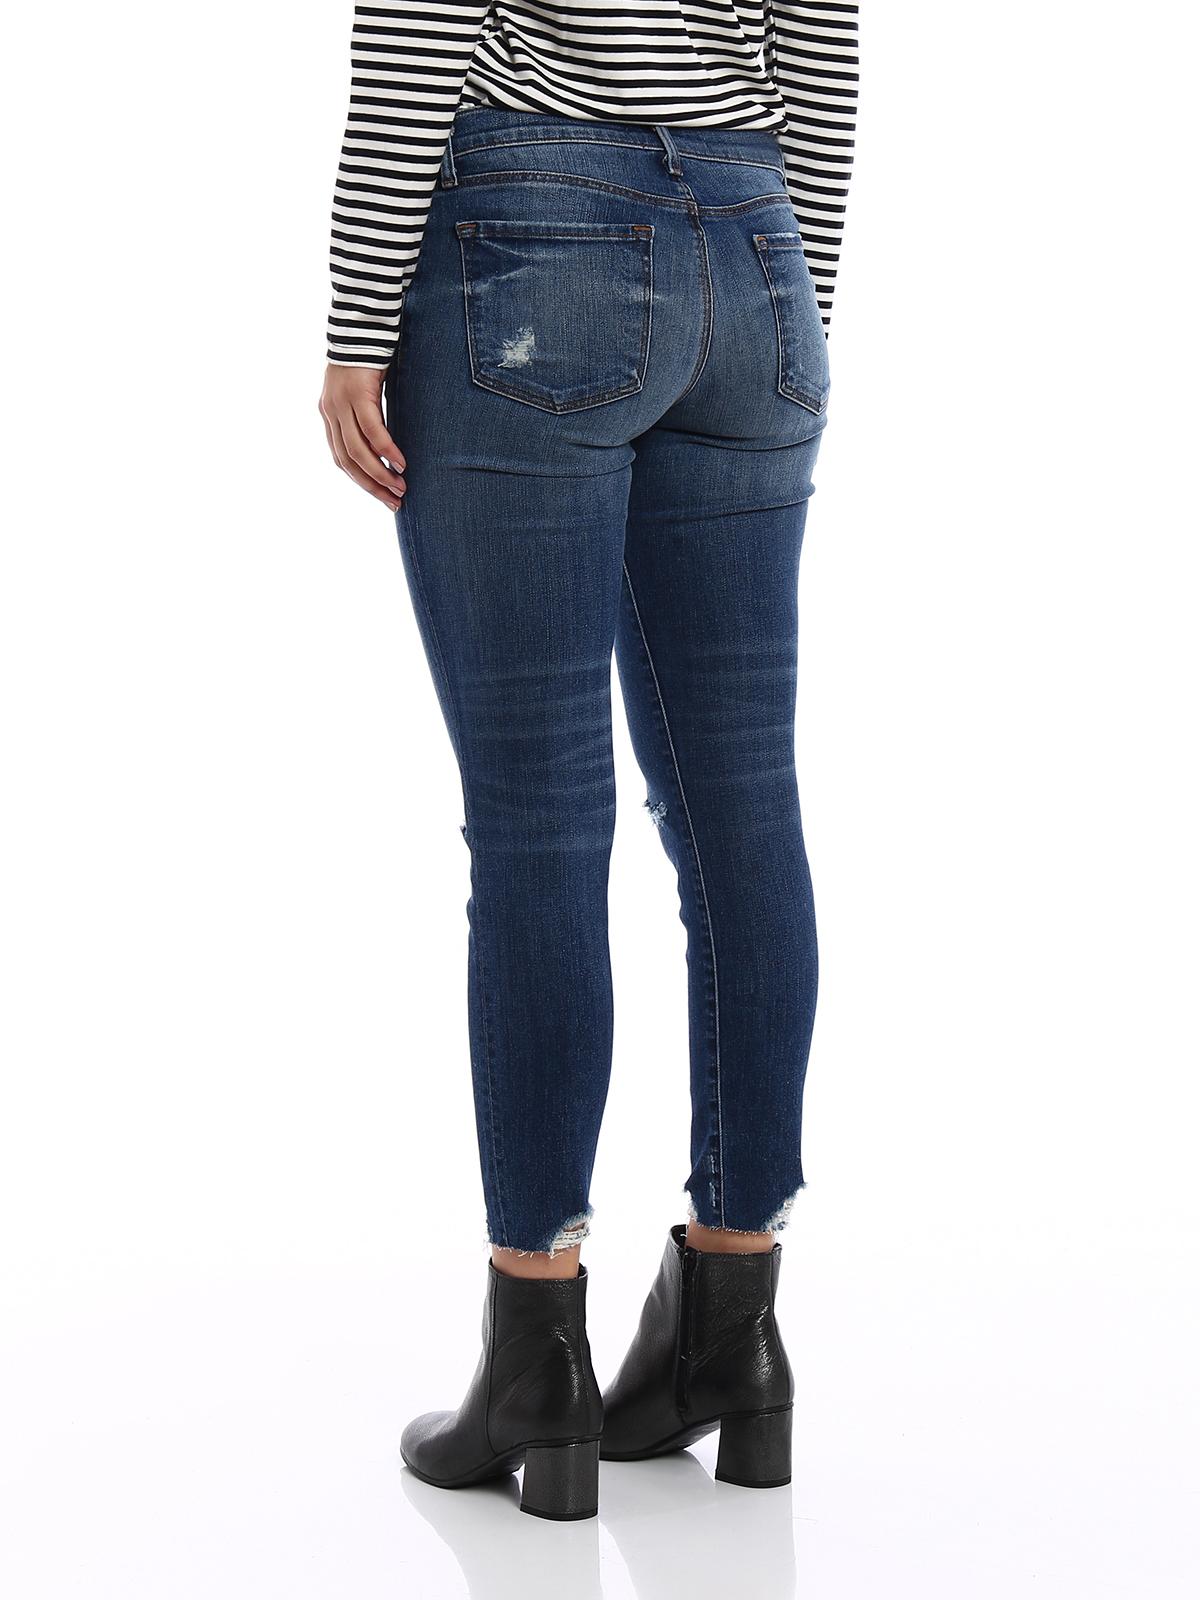 f18497c0aa5a6 J Brand - Cropped destruct denim jeans - skinny jeans - JB001102 ...